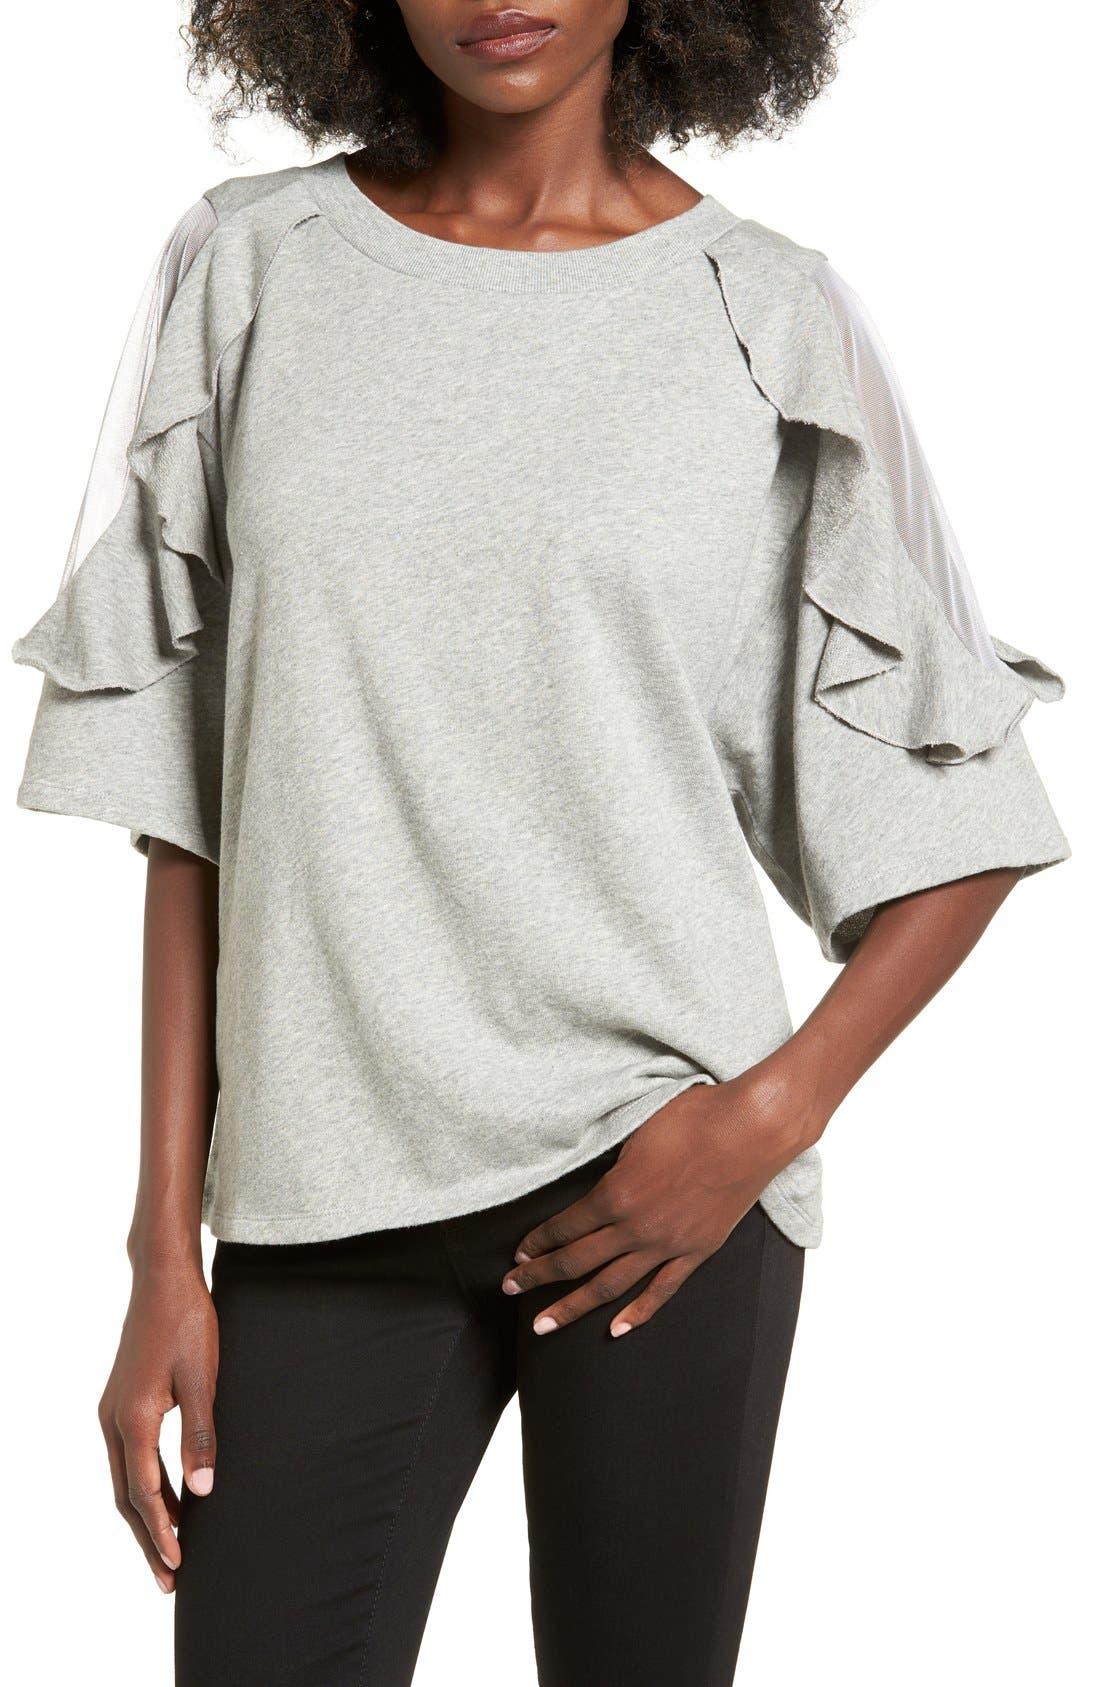 Alternate Image 1 Selected - BP. Ruffle Sleeve Sweatshirt